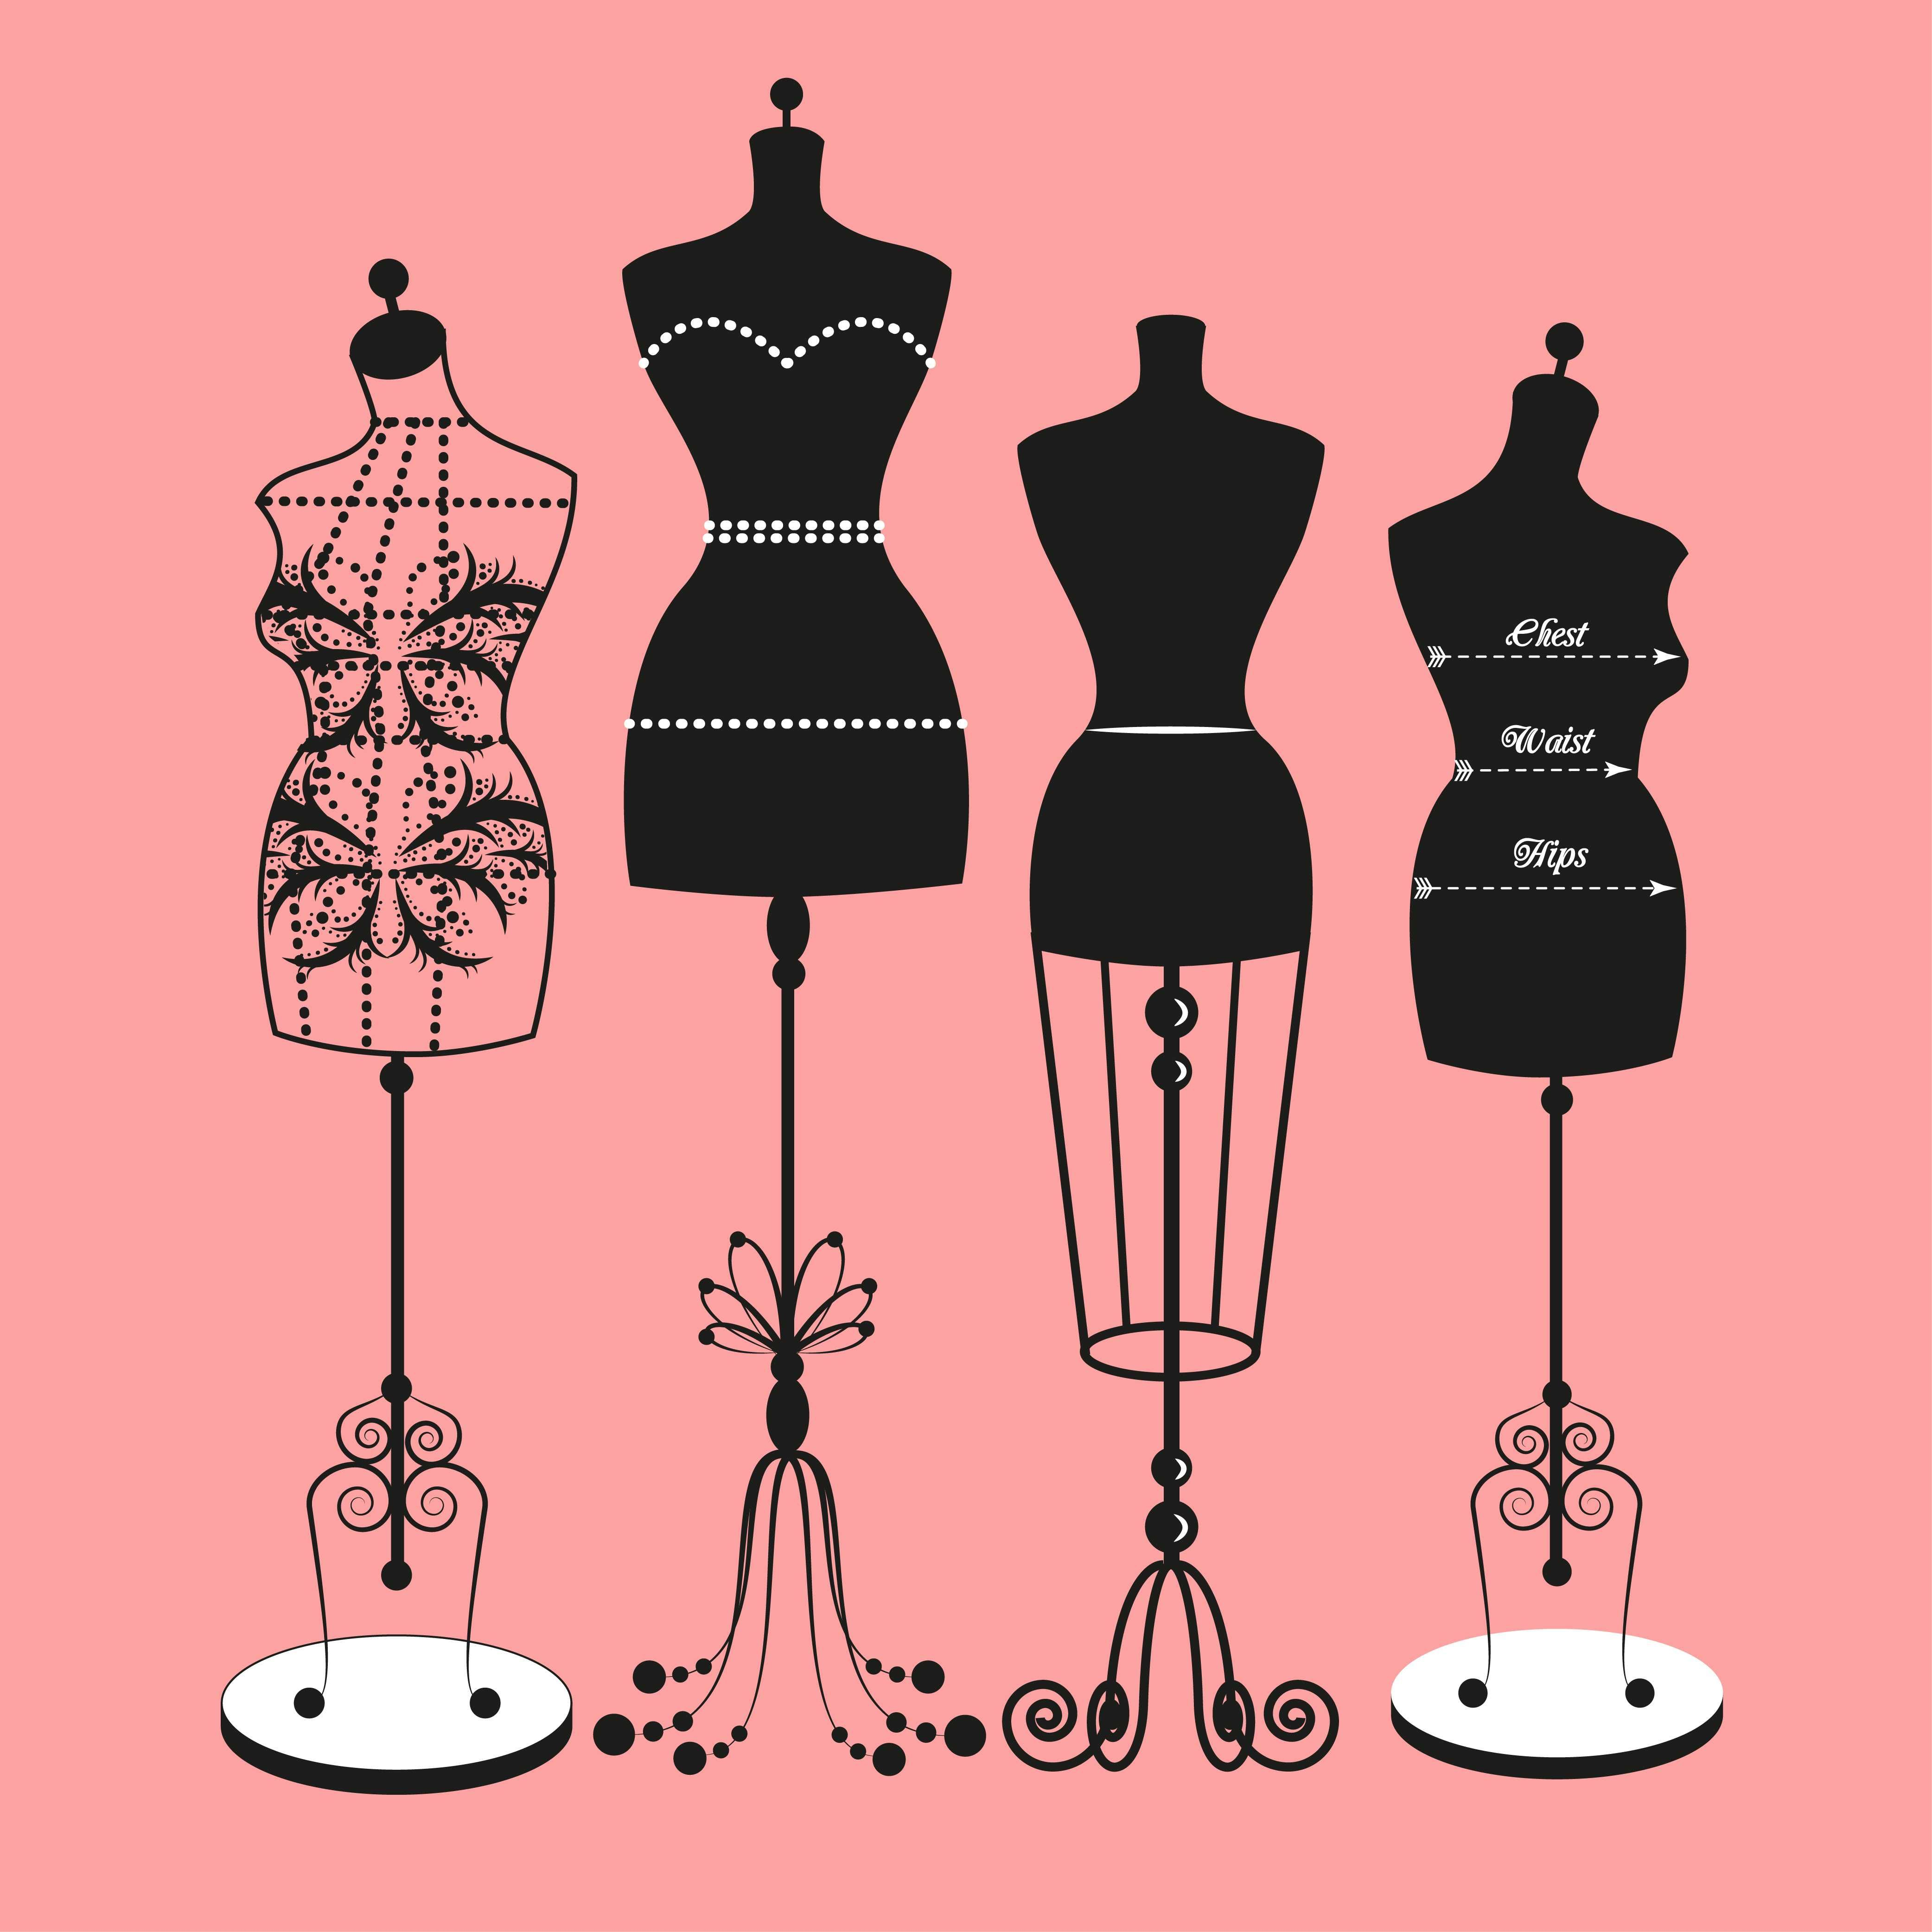 Kleiderständer clipart  Carreira: Modelista | Croquis, Vintage pictures and Bullet